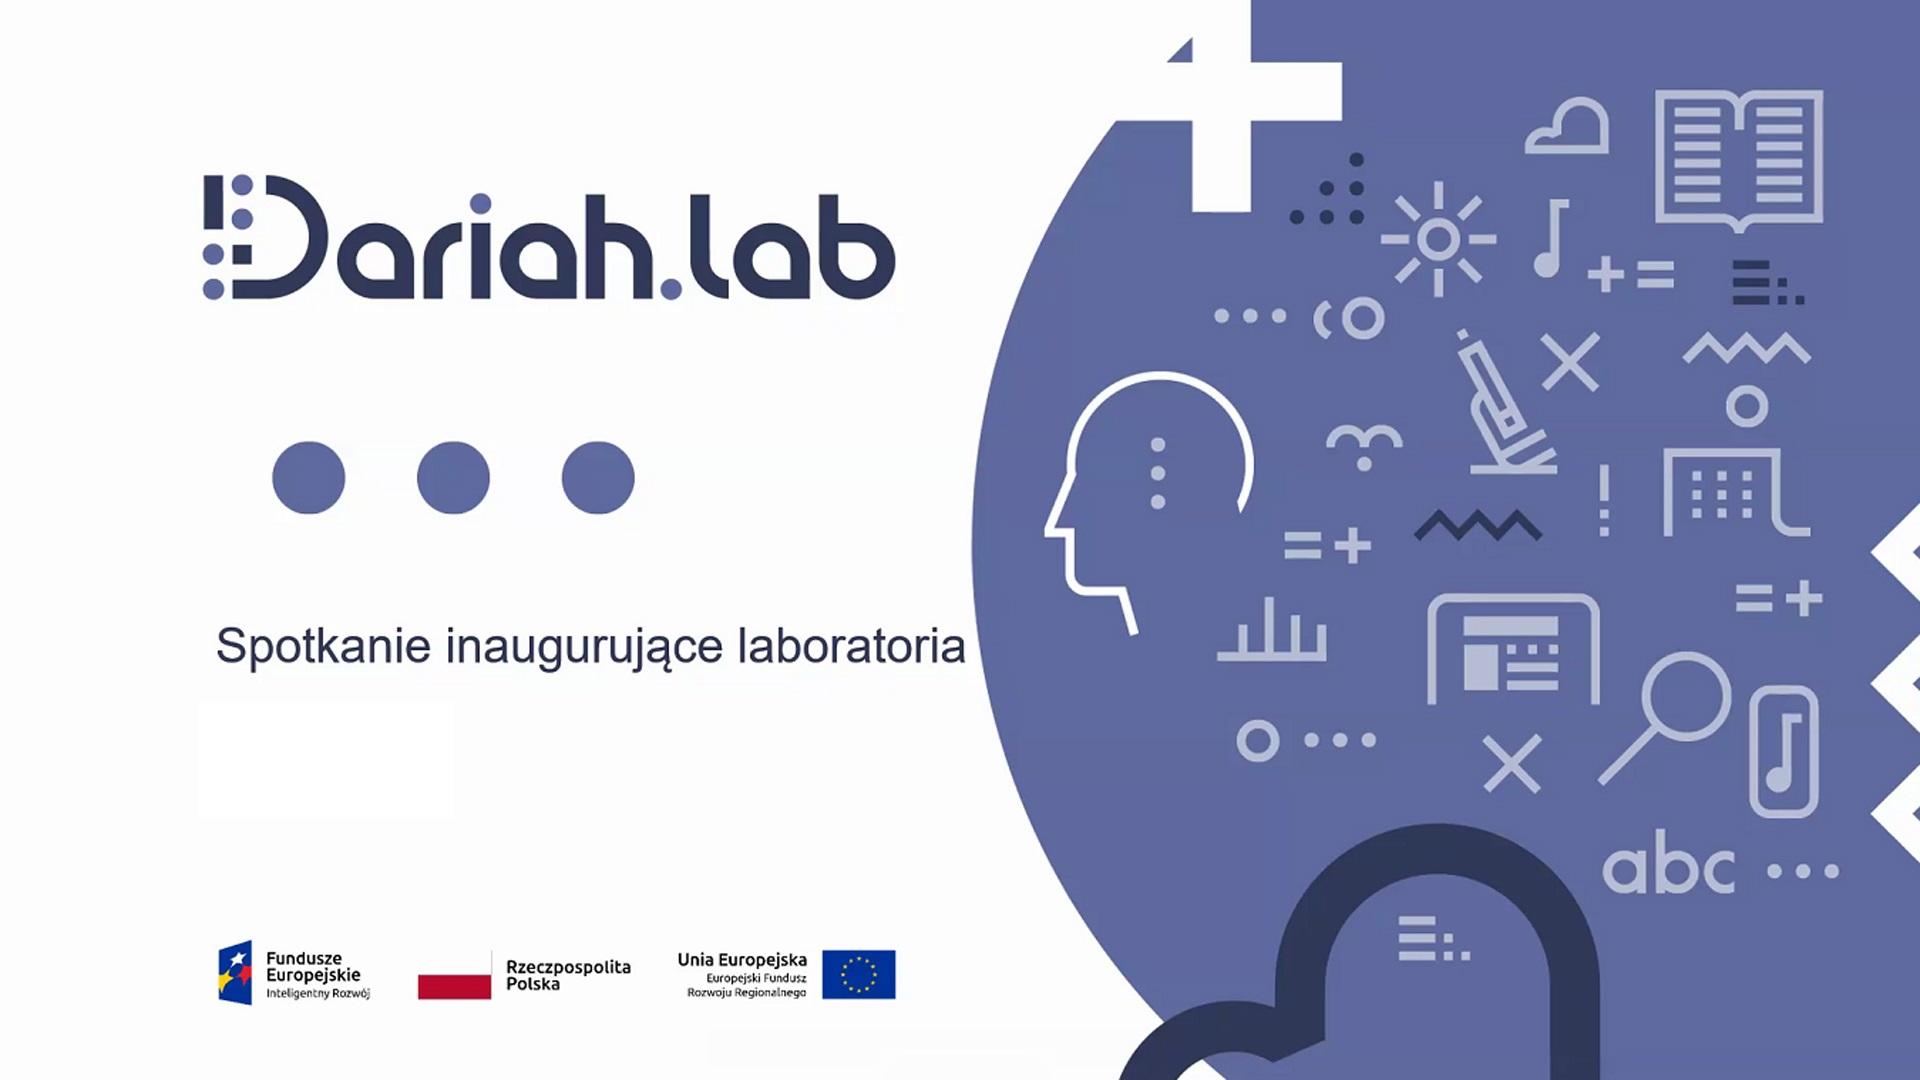 DARIAH.LAB: inauguration of laboratories